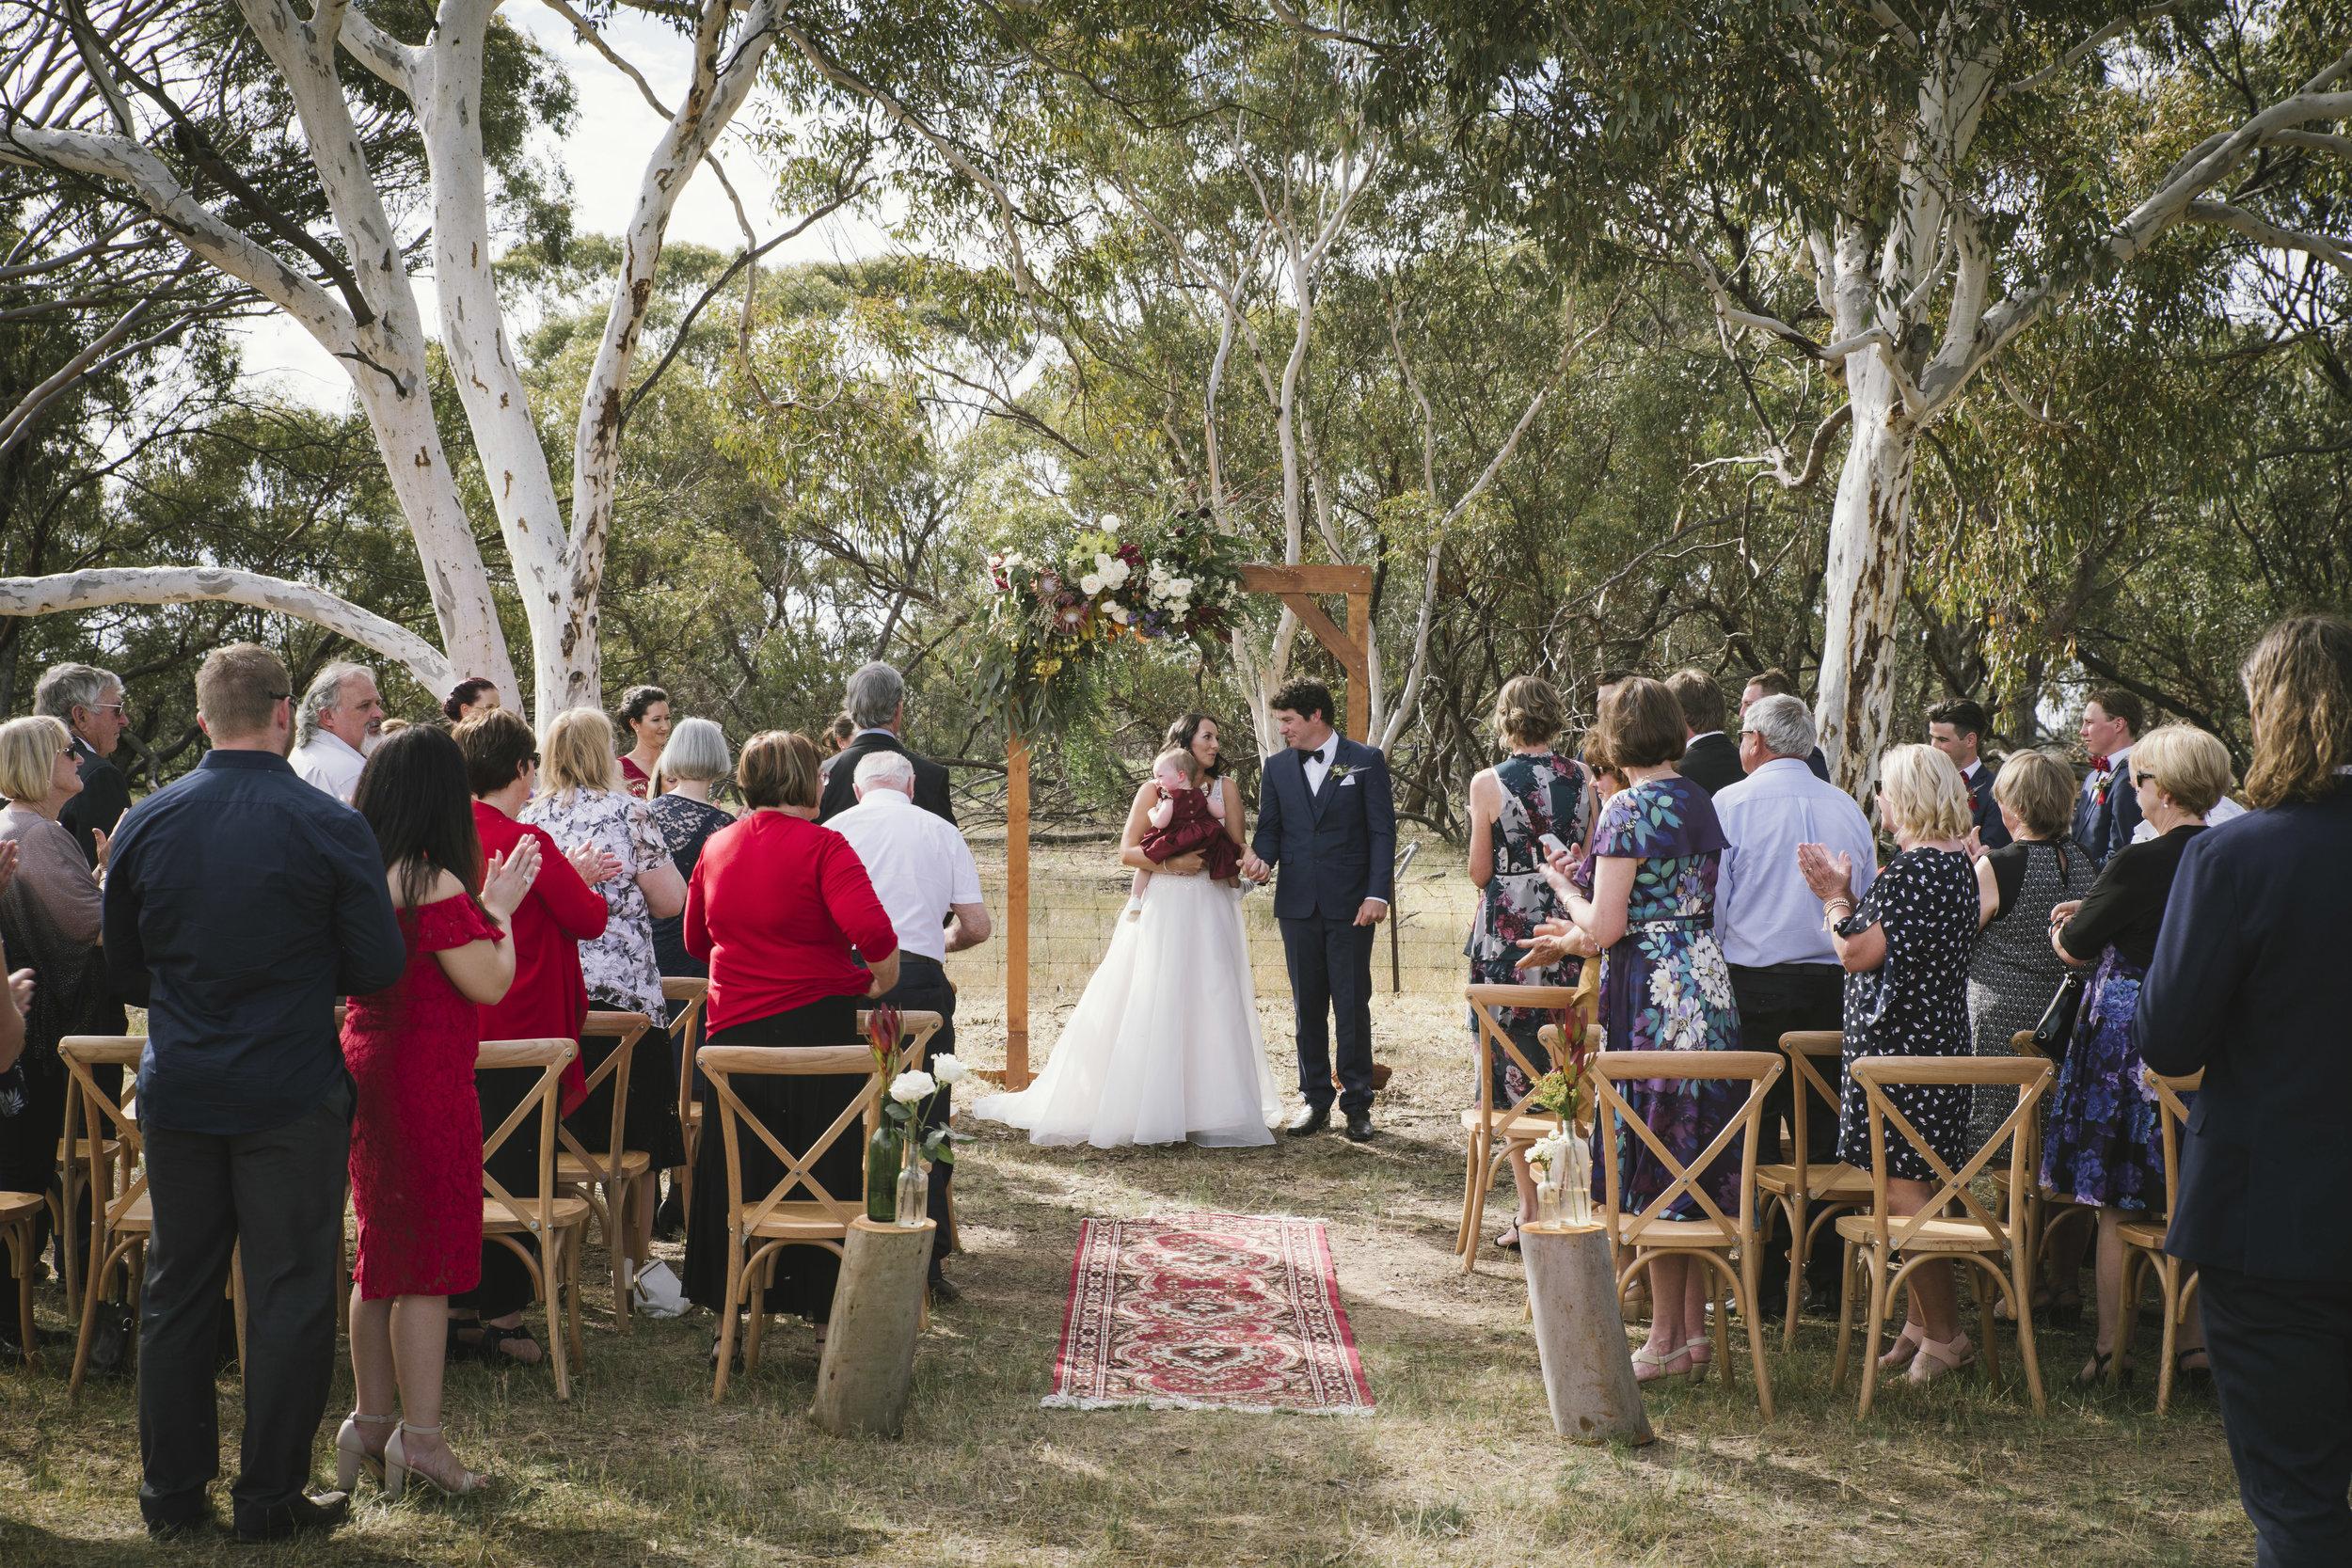 Angie Roe Photography Wheatbelt Avon Valley Farm Wedding (22).jpg